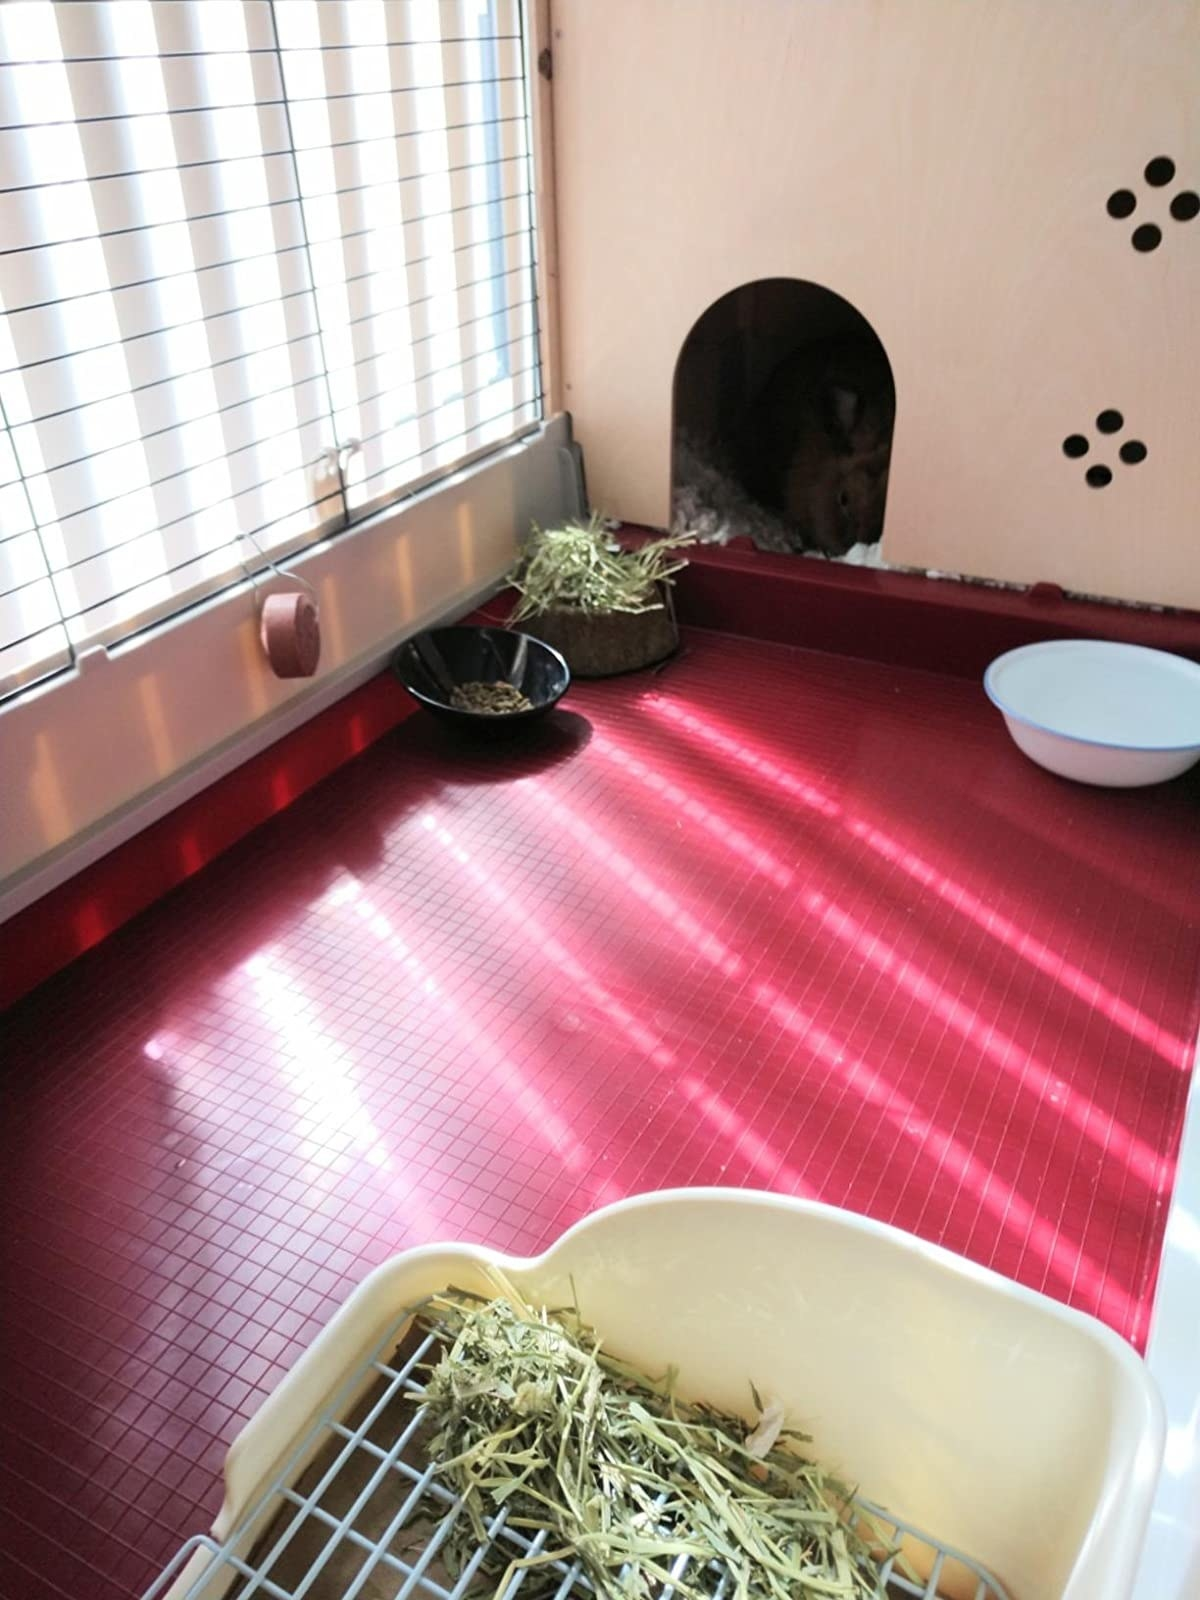 A very clean rabbit enclosure